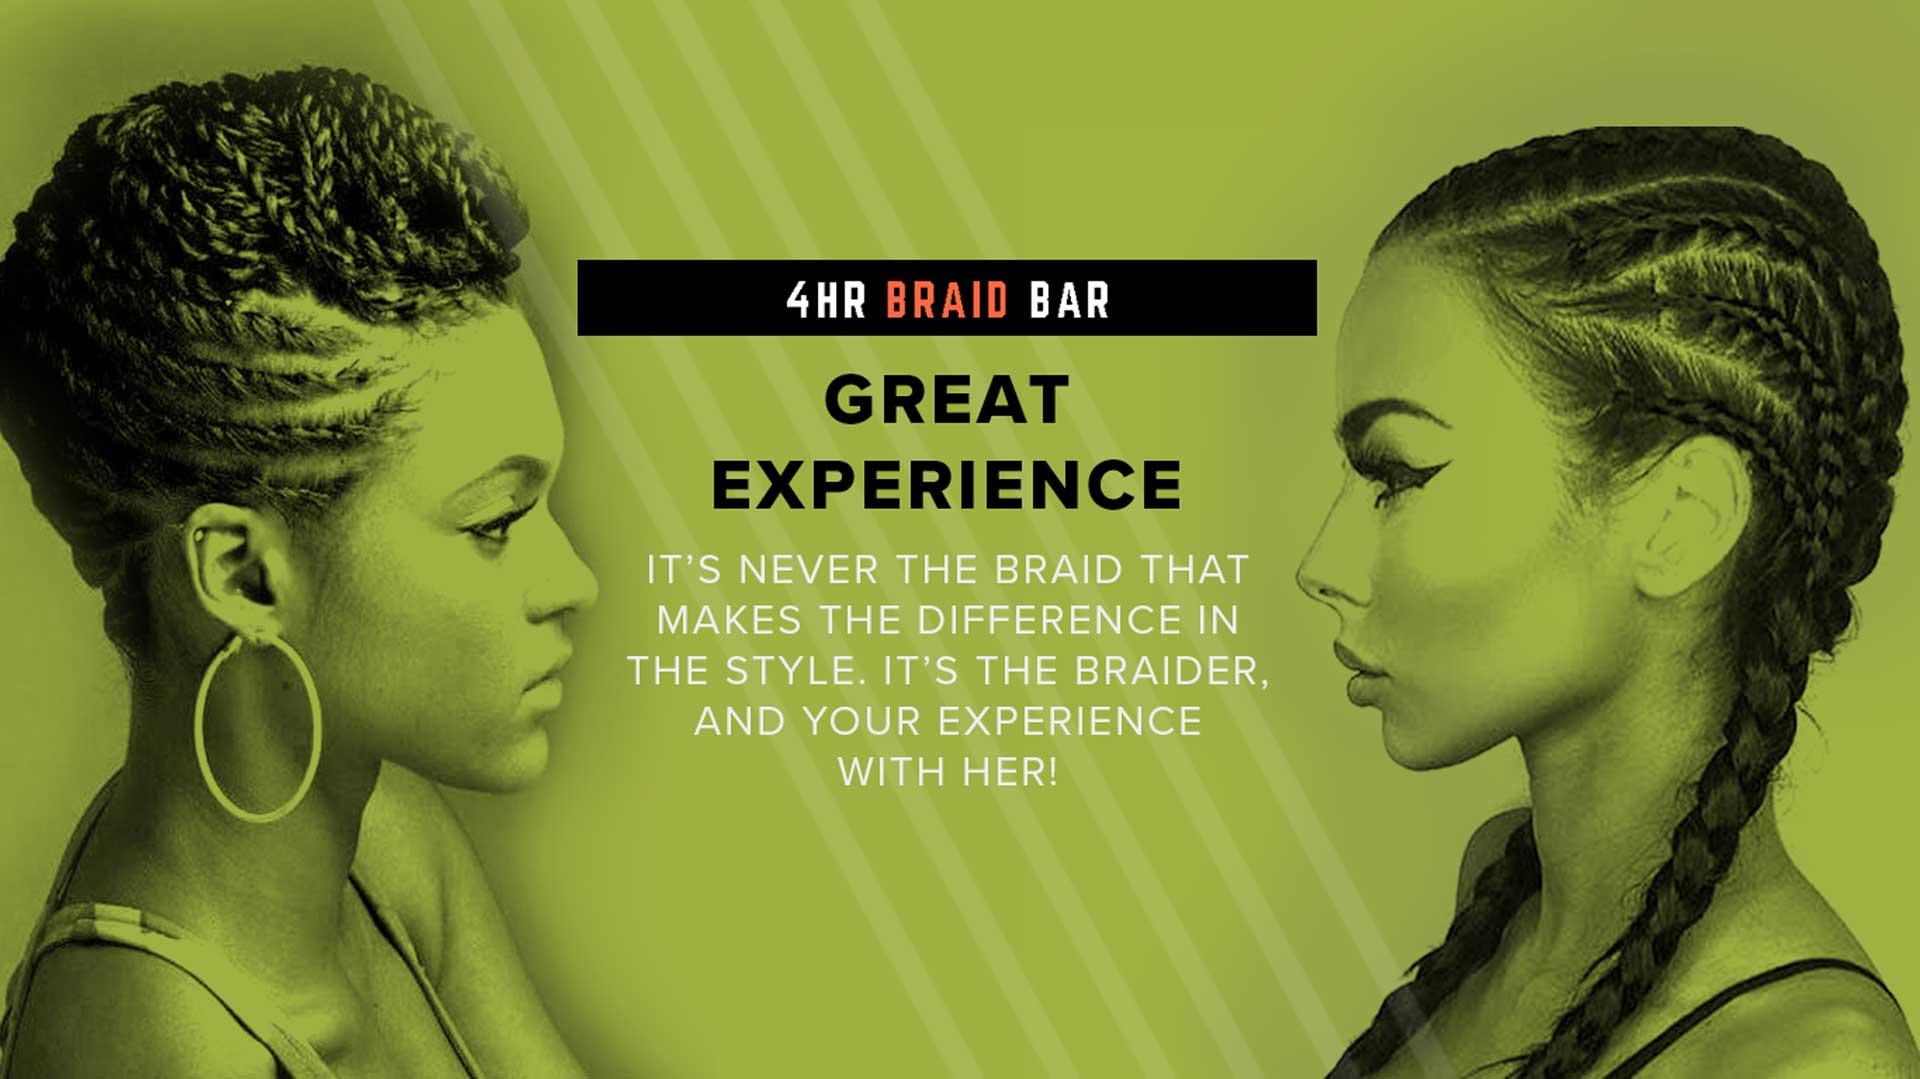 4HR Braid Bar Great Experience